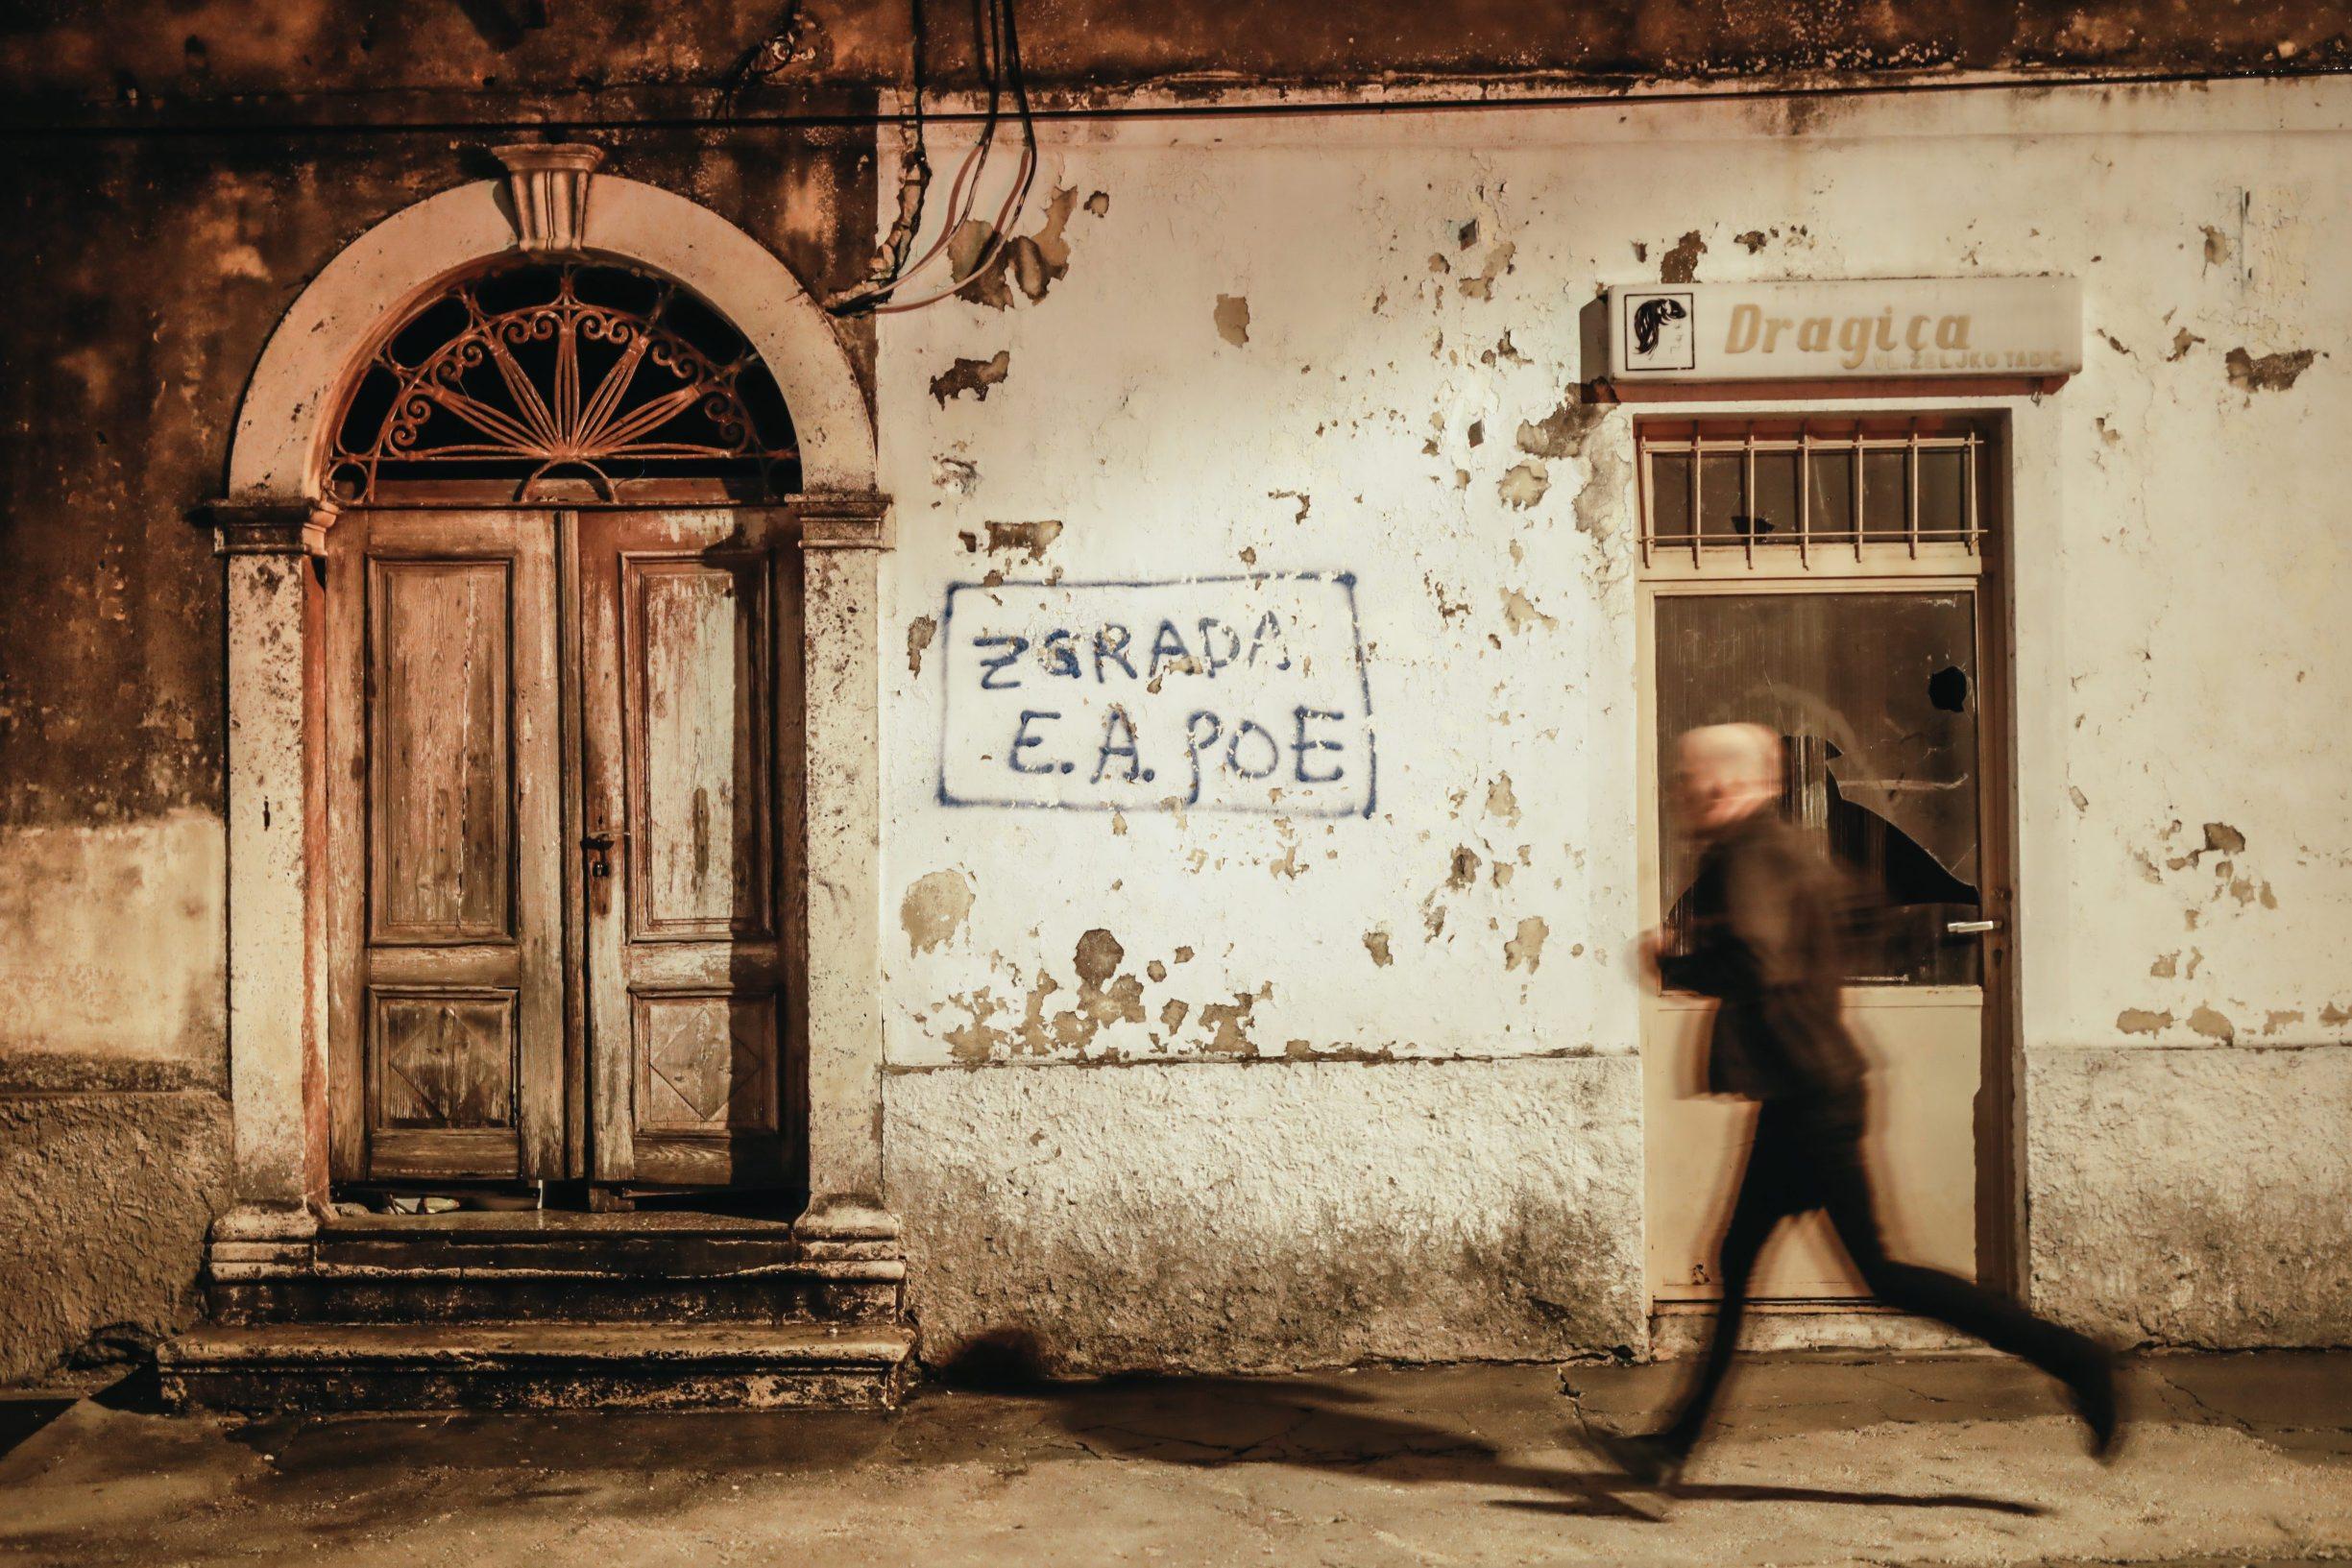 Benkovac, 031219 Reportaza o Benkovcu. Na fotografiji poznati benkovacki grafiti. Foto: Danijel Soldo / CROPIX